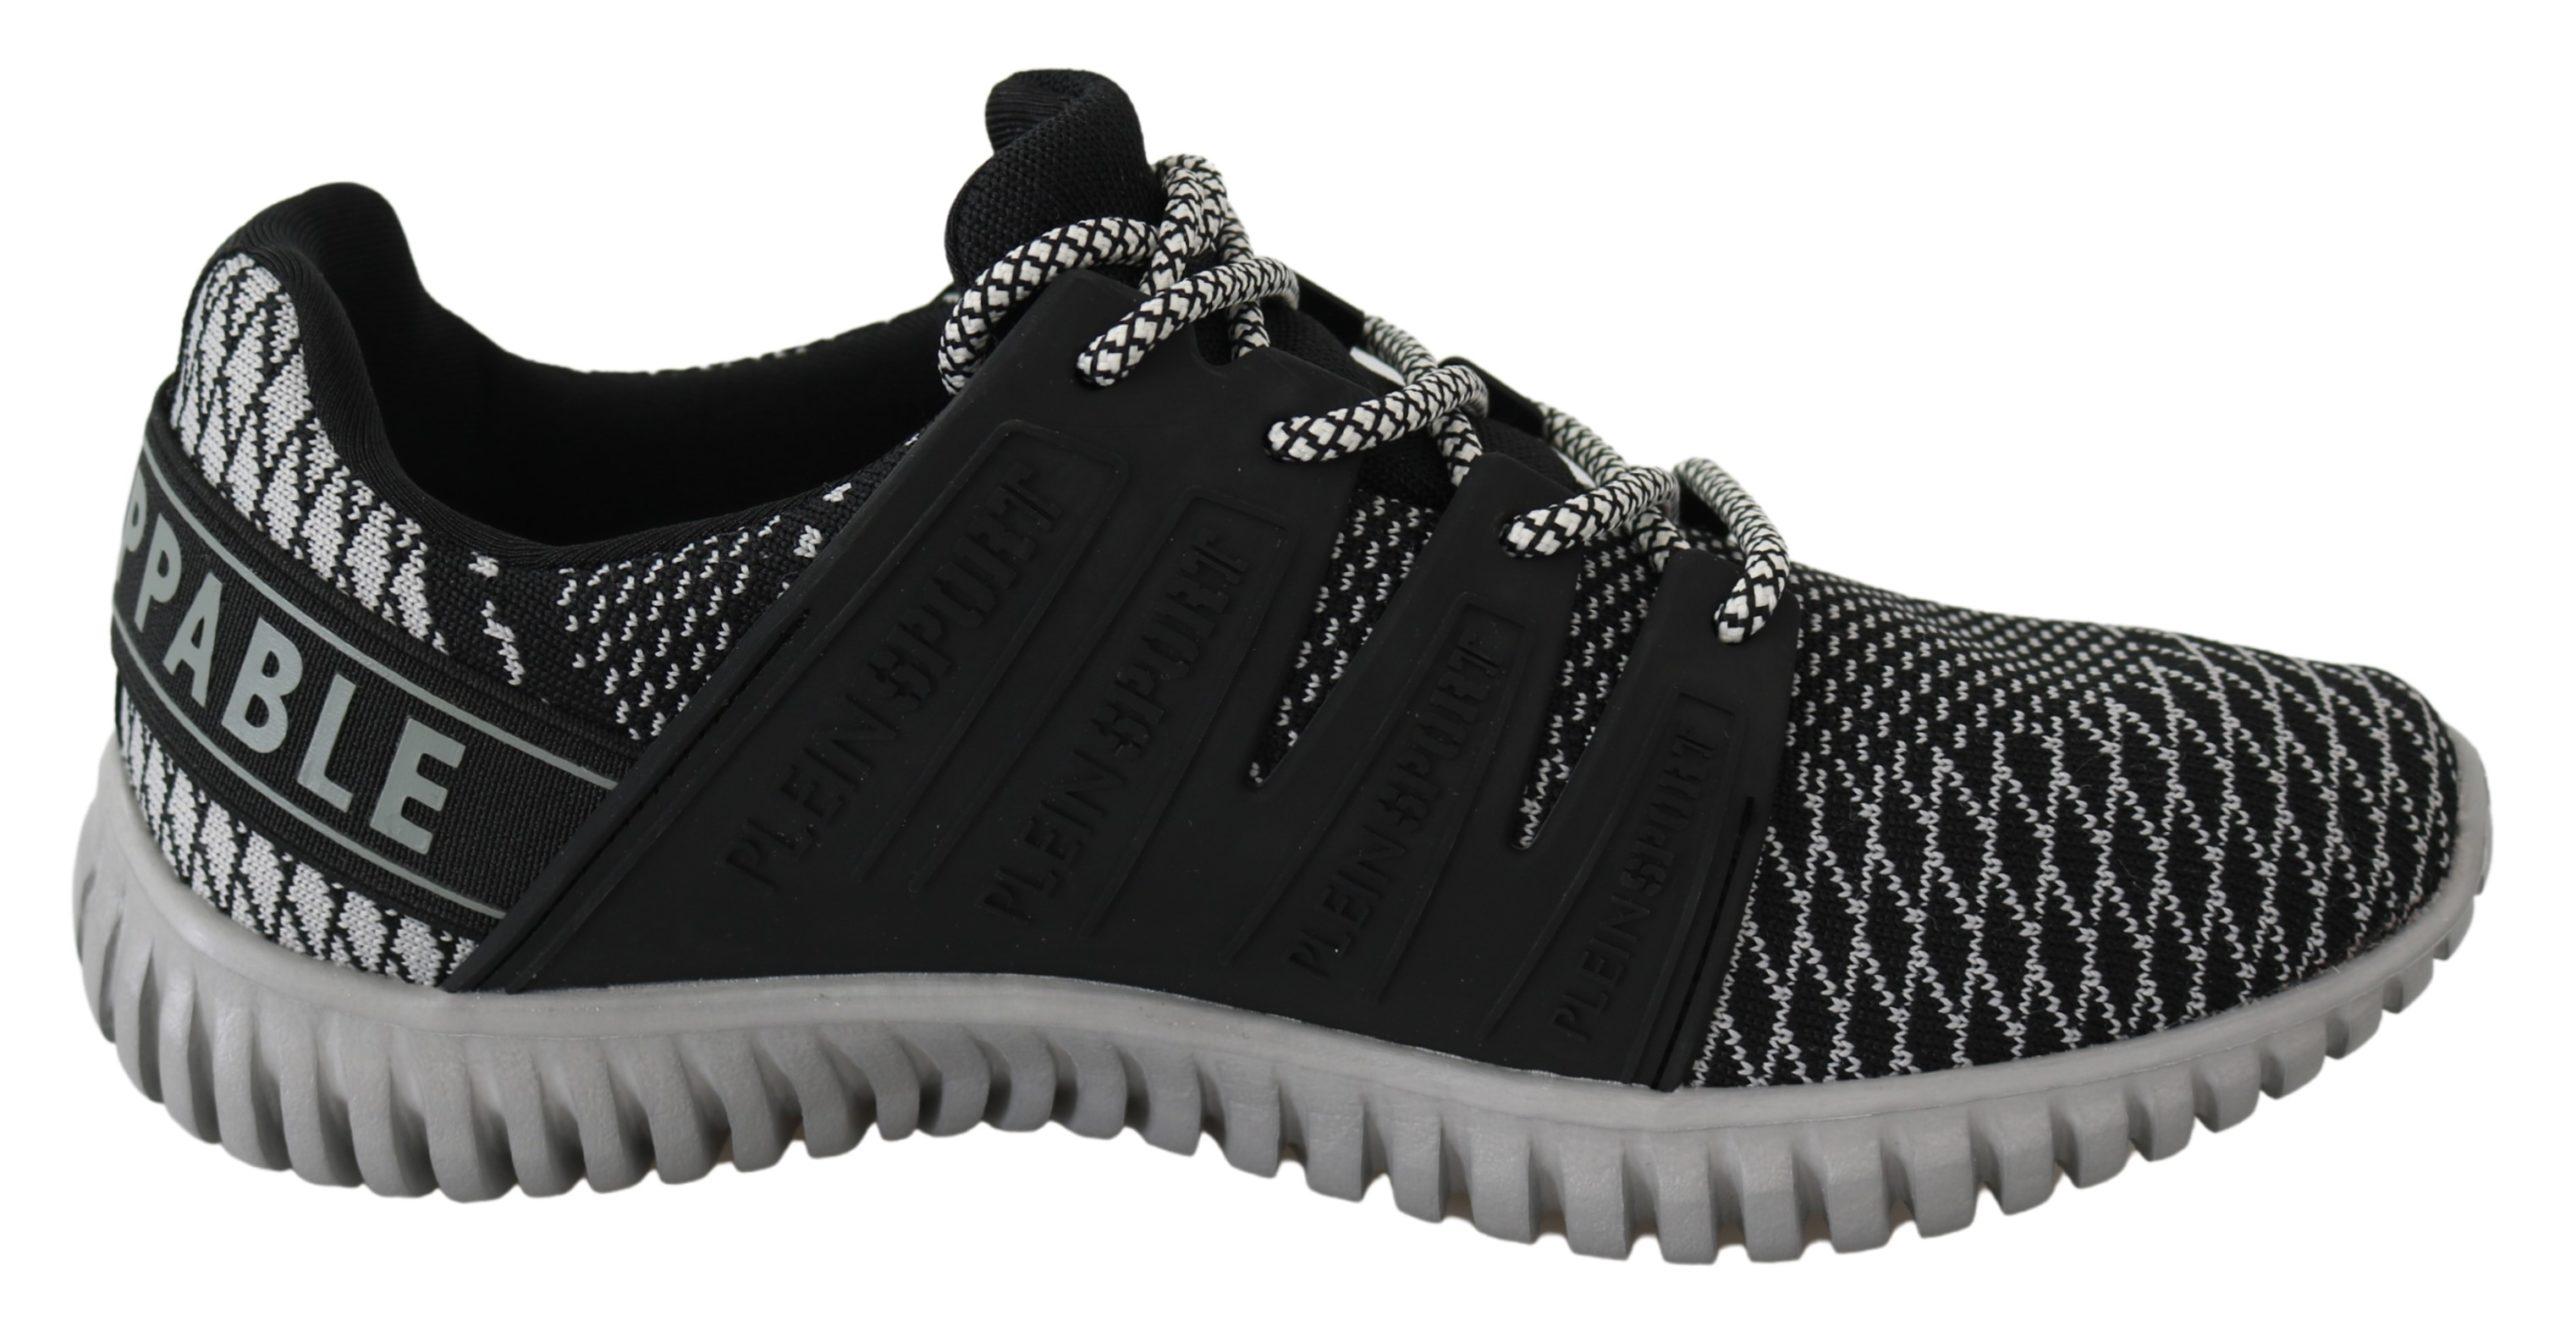 Black Polyester Runner Mason Sneakers Shoes - EU40/US7